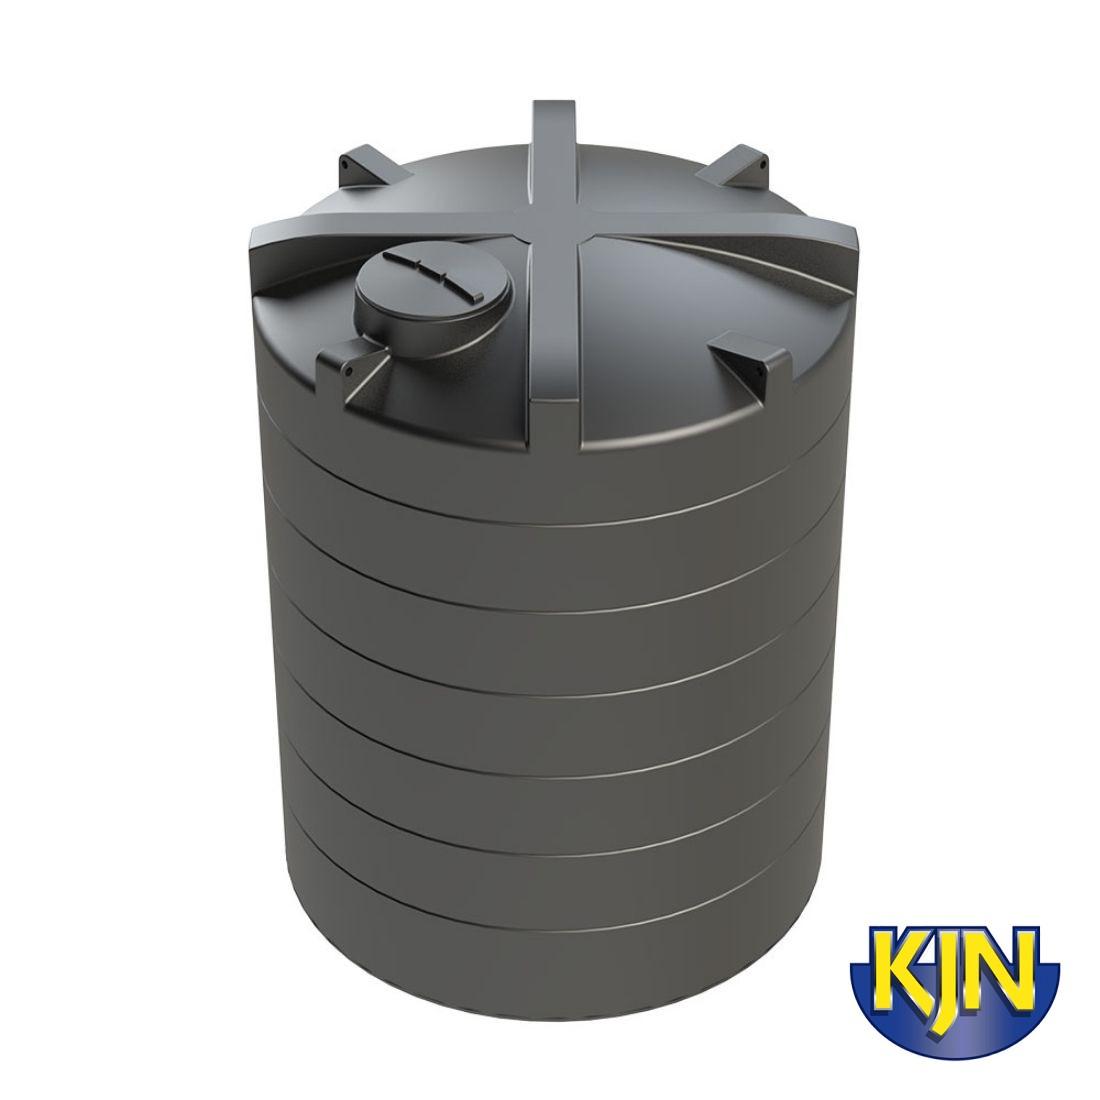 Enduramaxx 16,800 Litre Vertical Potable WRAS Water Storage Tank